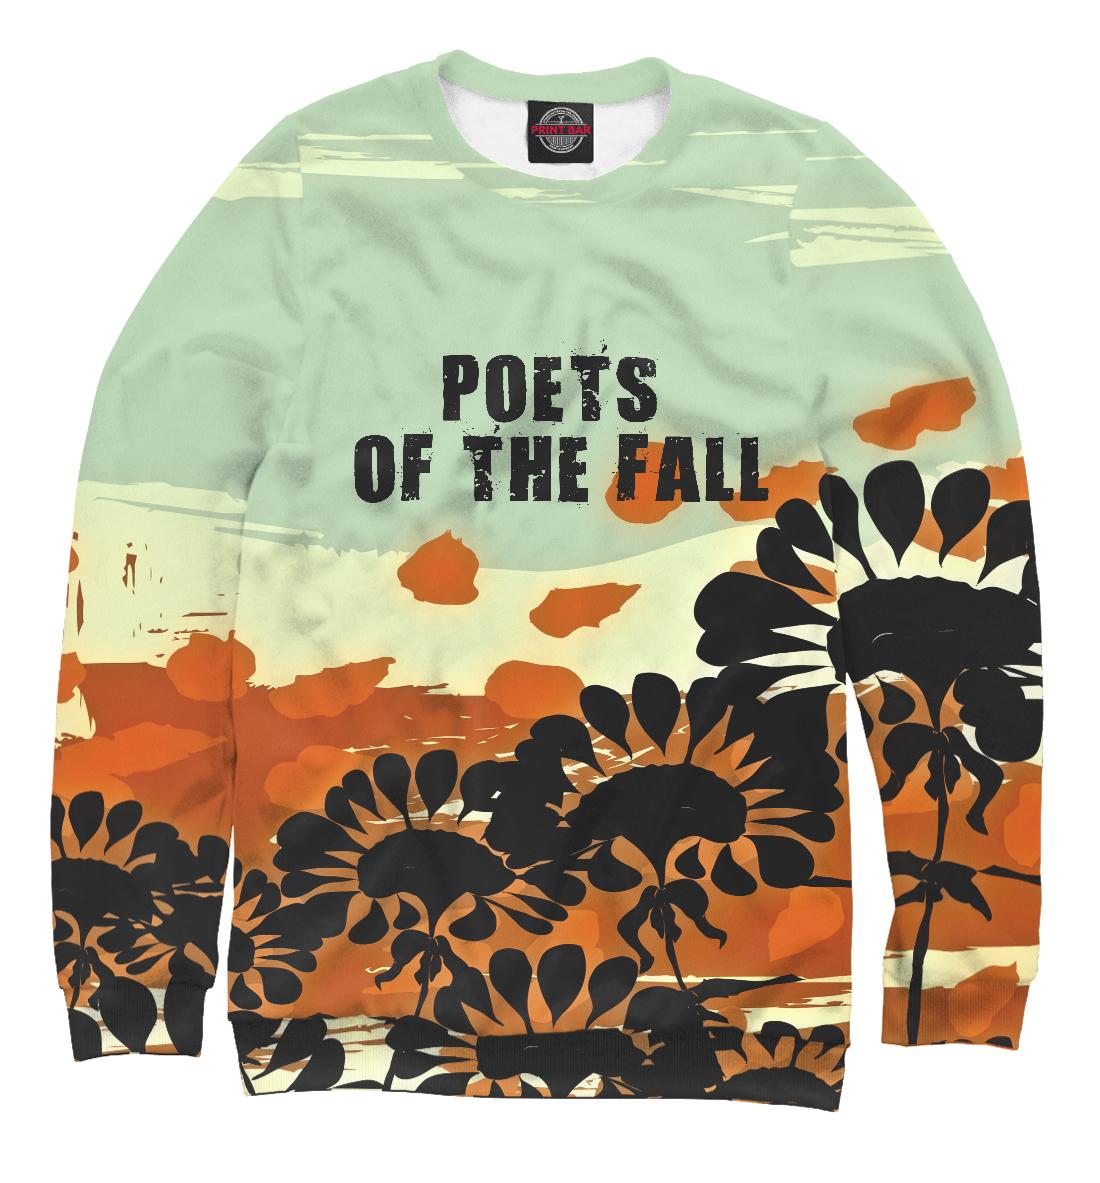 Купить Poets of the fall band, Printbar, Свитшоты, MZK-135820-swi-1